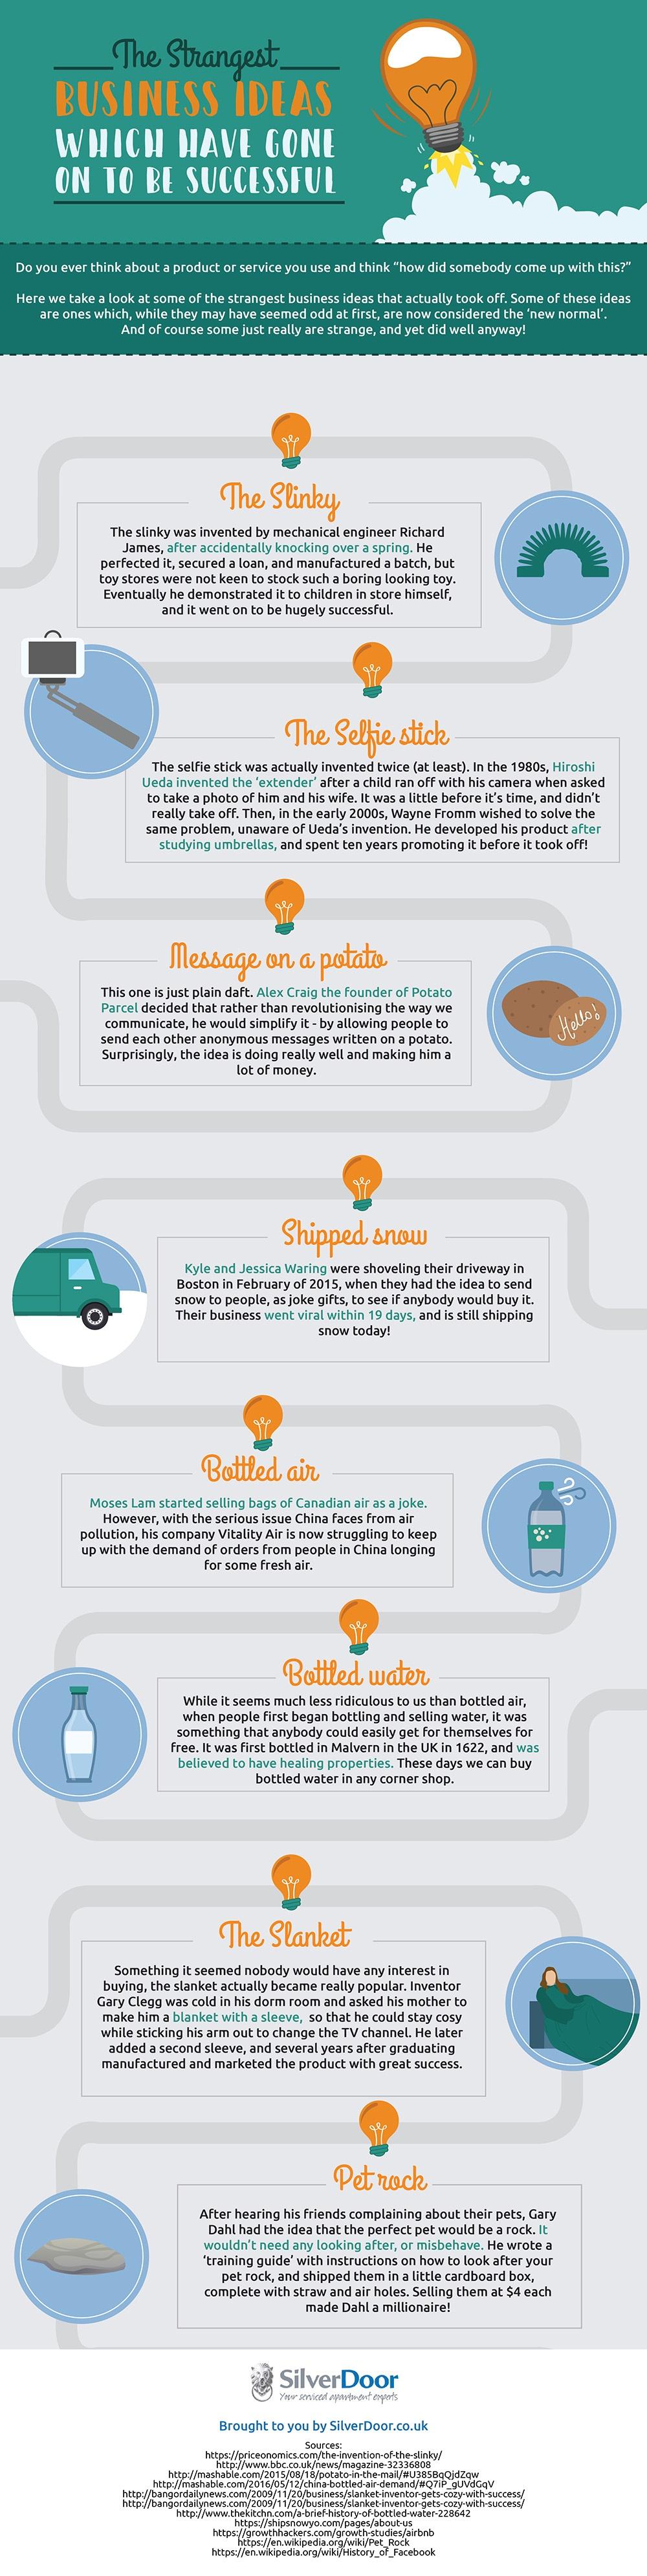 Strangest-Business-Ideas-Infographic.jpg